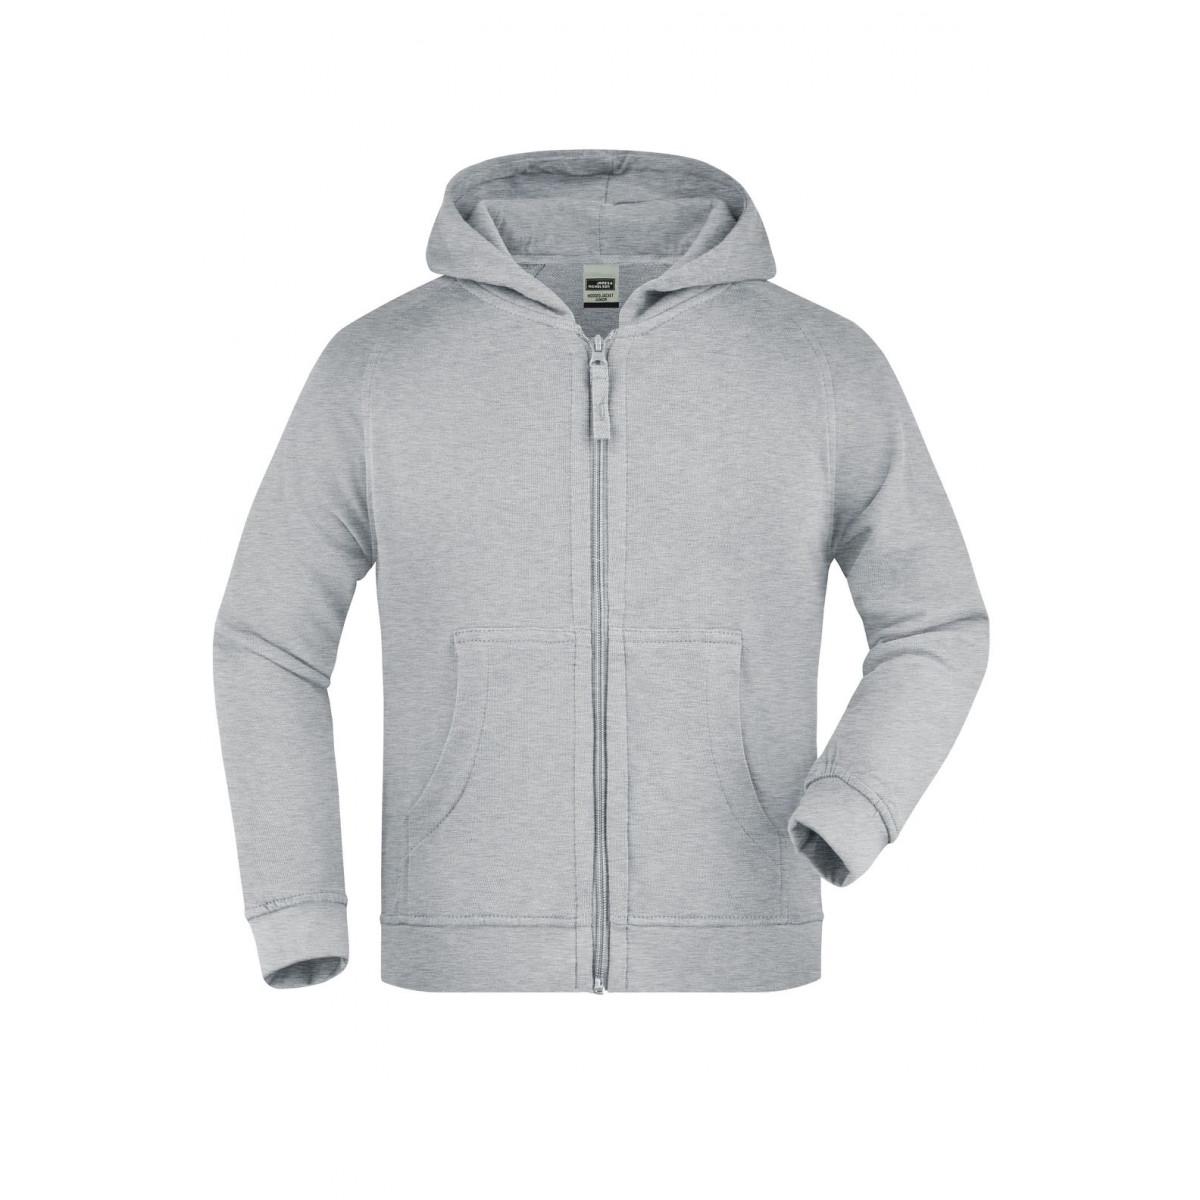 Толстовка детская JN059K Hooded Jacket Junior - Серый меланж